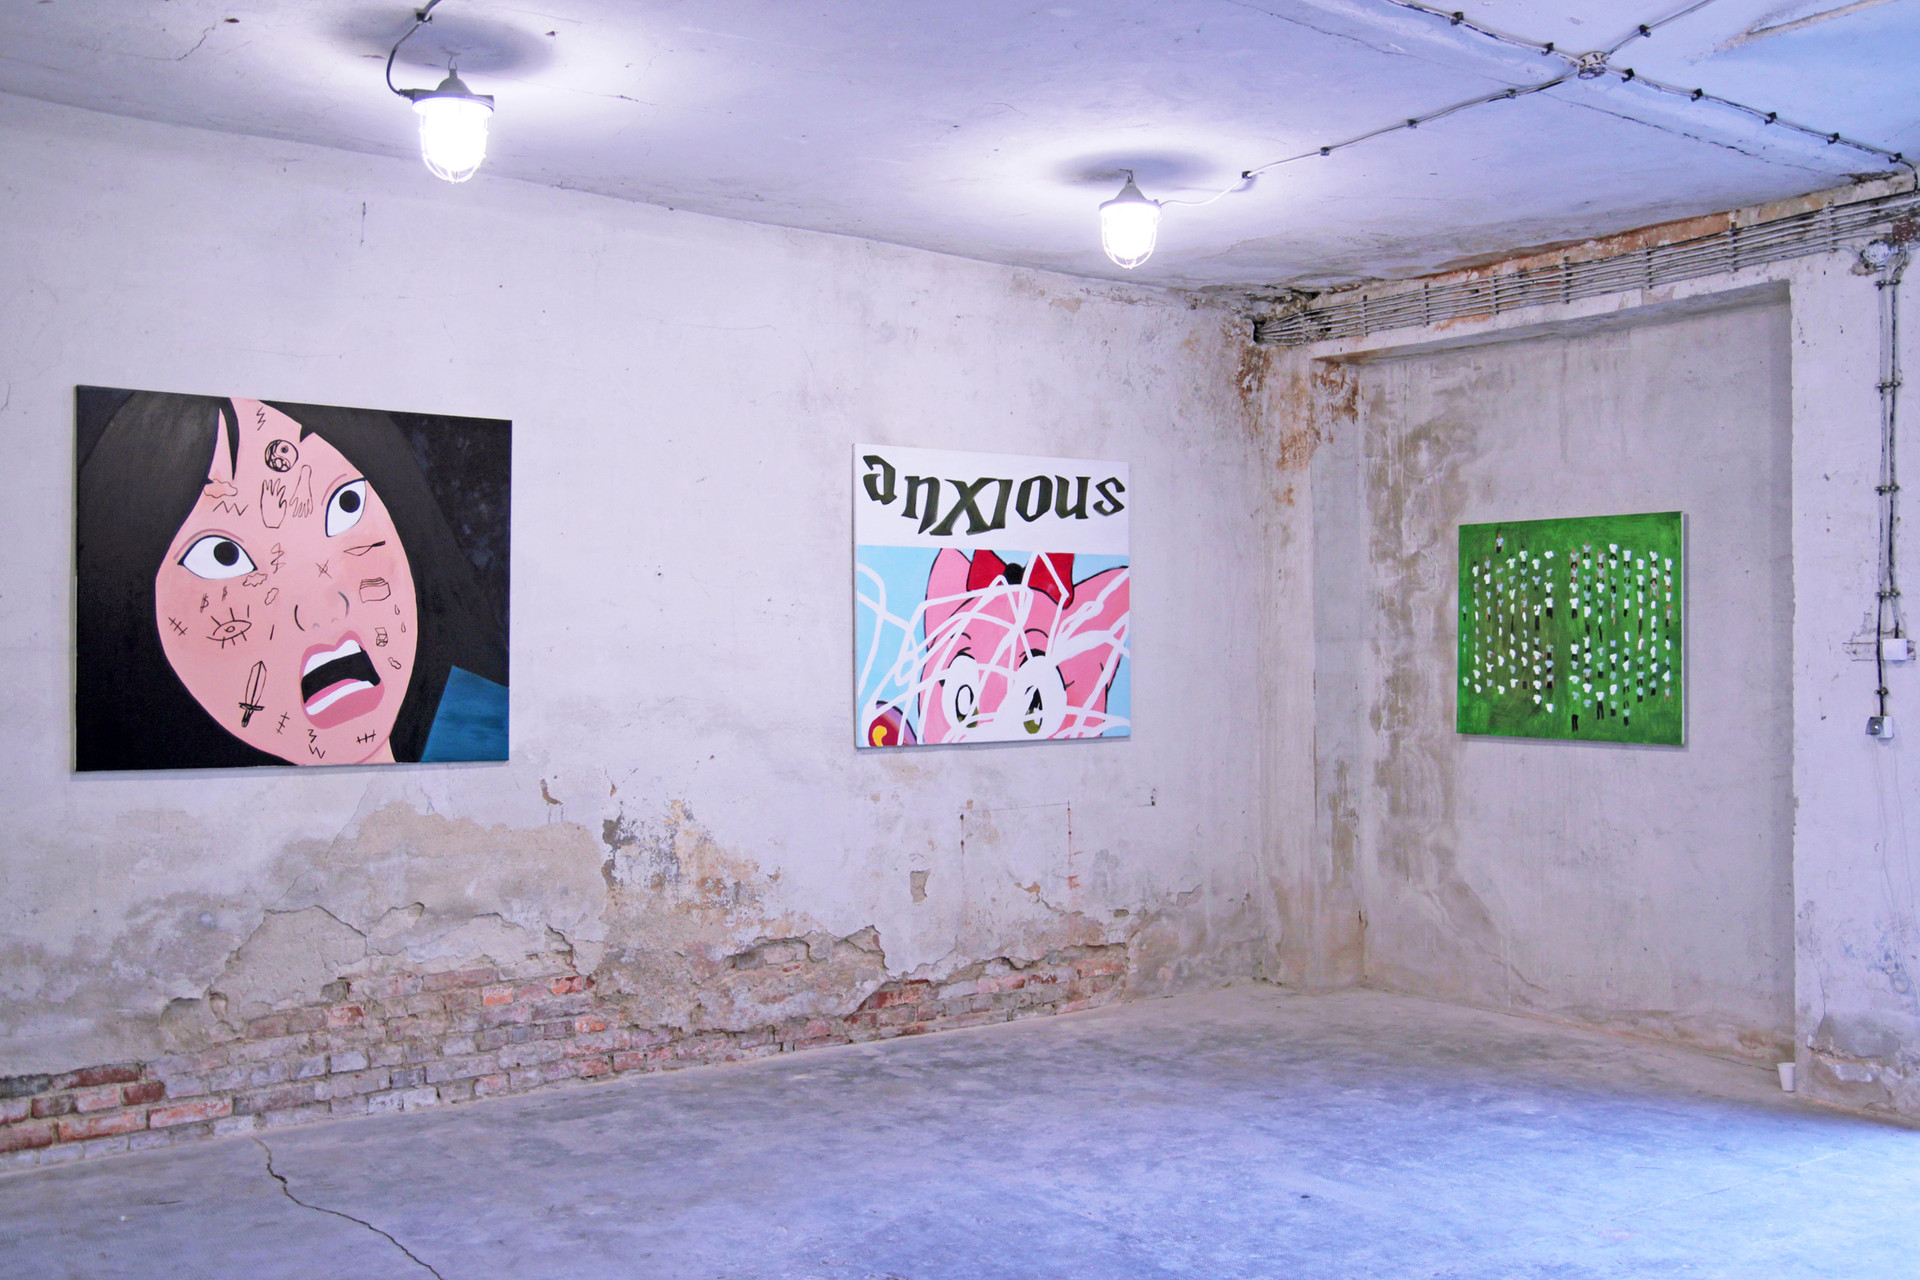 OBITE_ŁOKCIE-exhibitionview02.jpg